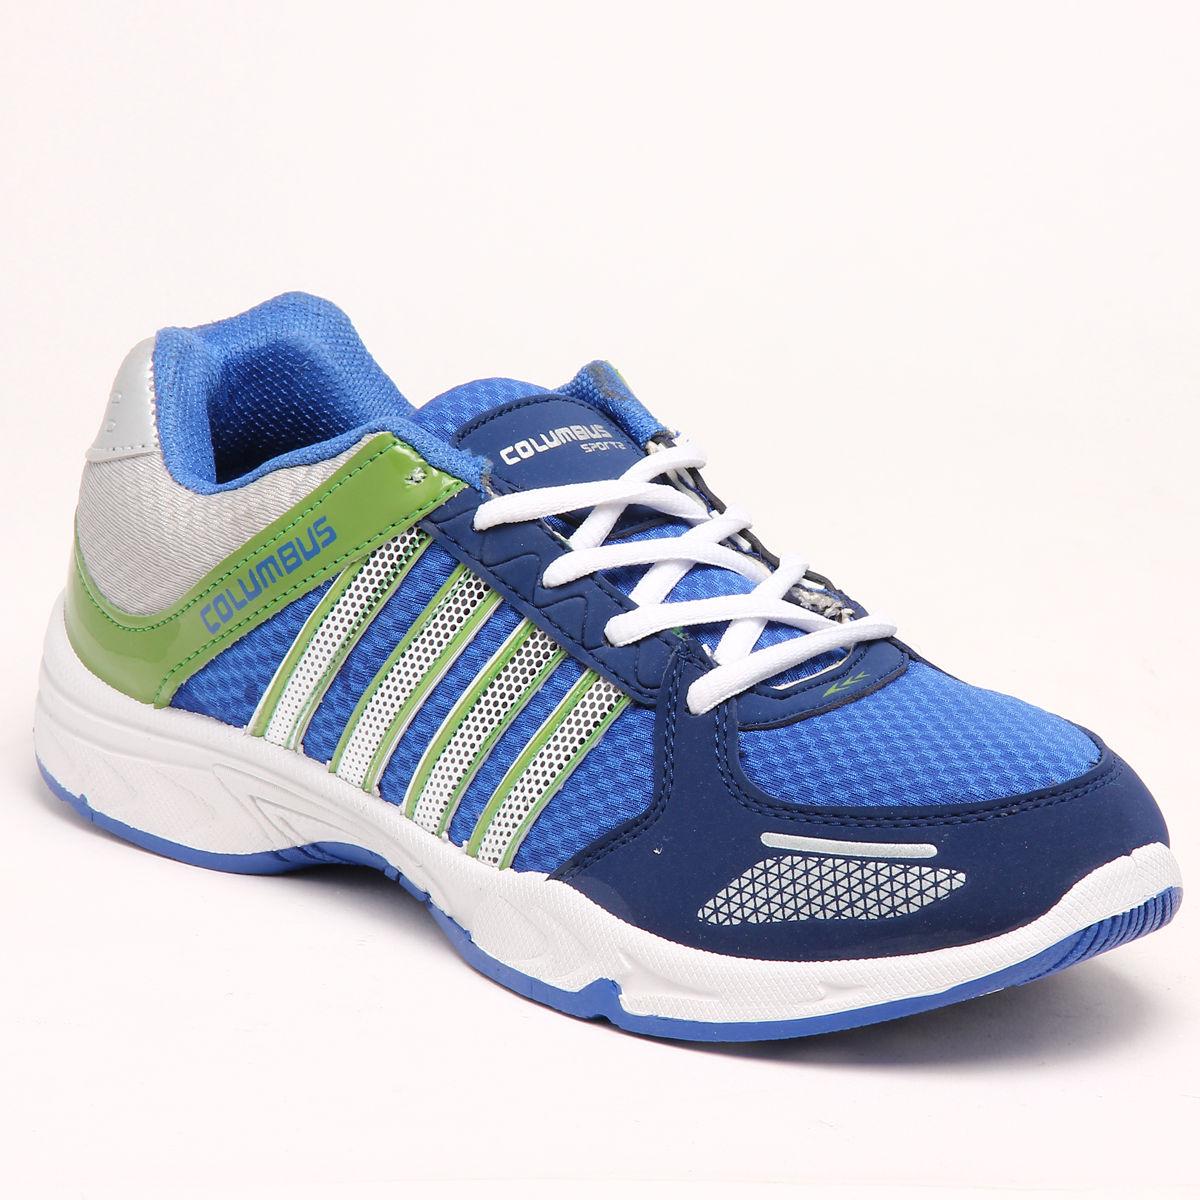 buy columbus pu sports shoes blue green 5627 at